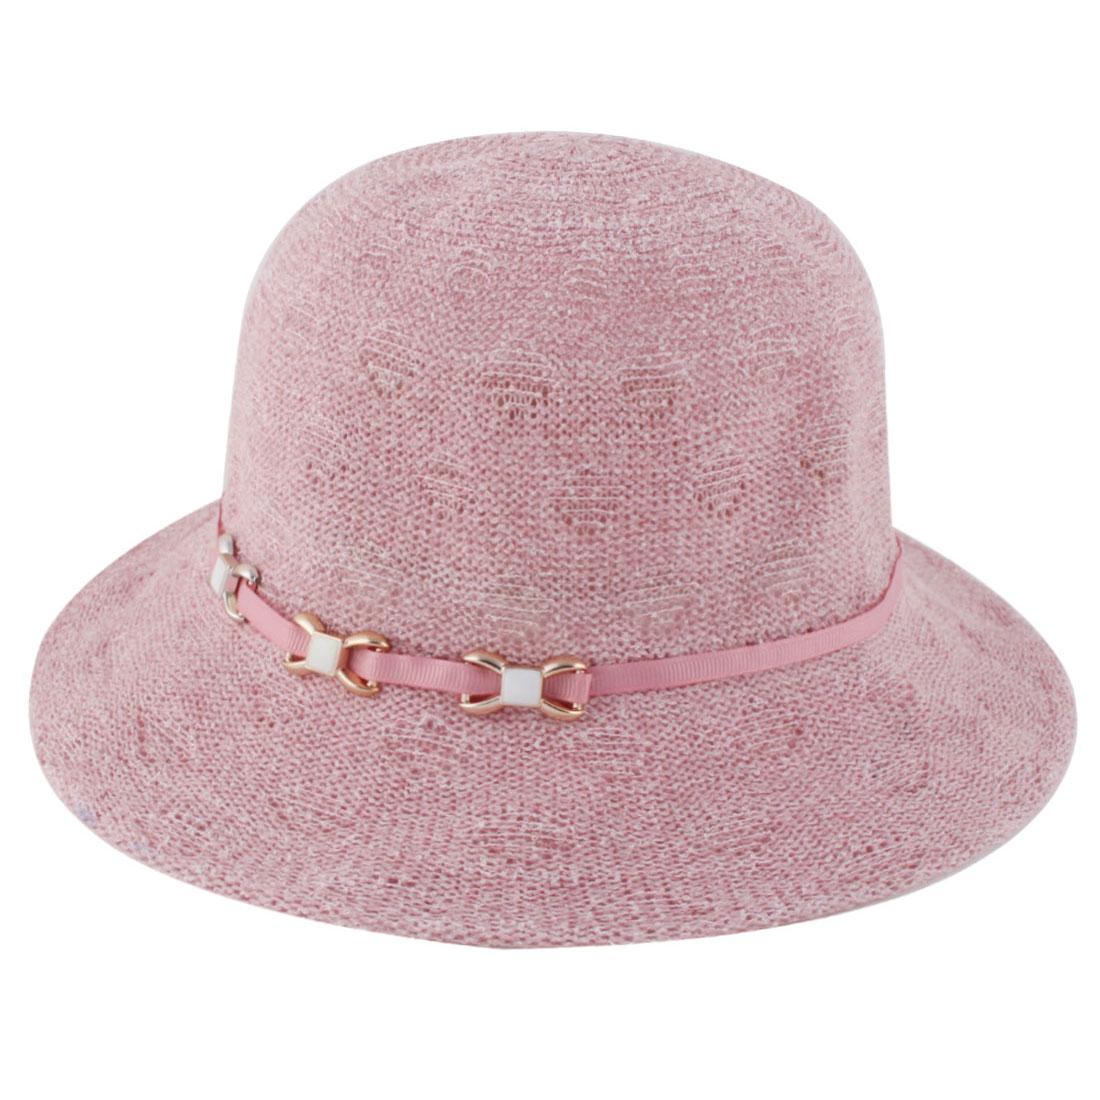 Women Polyester Woven Wide Brim Bowknot Embellished Beach Sun Hat Pink